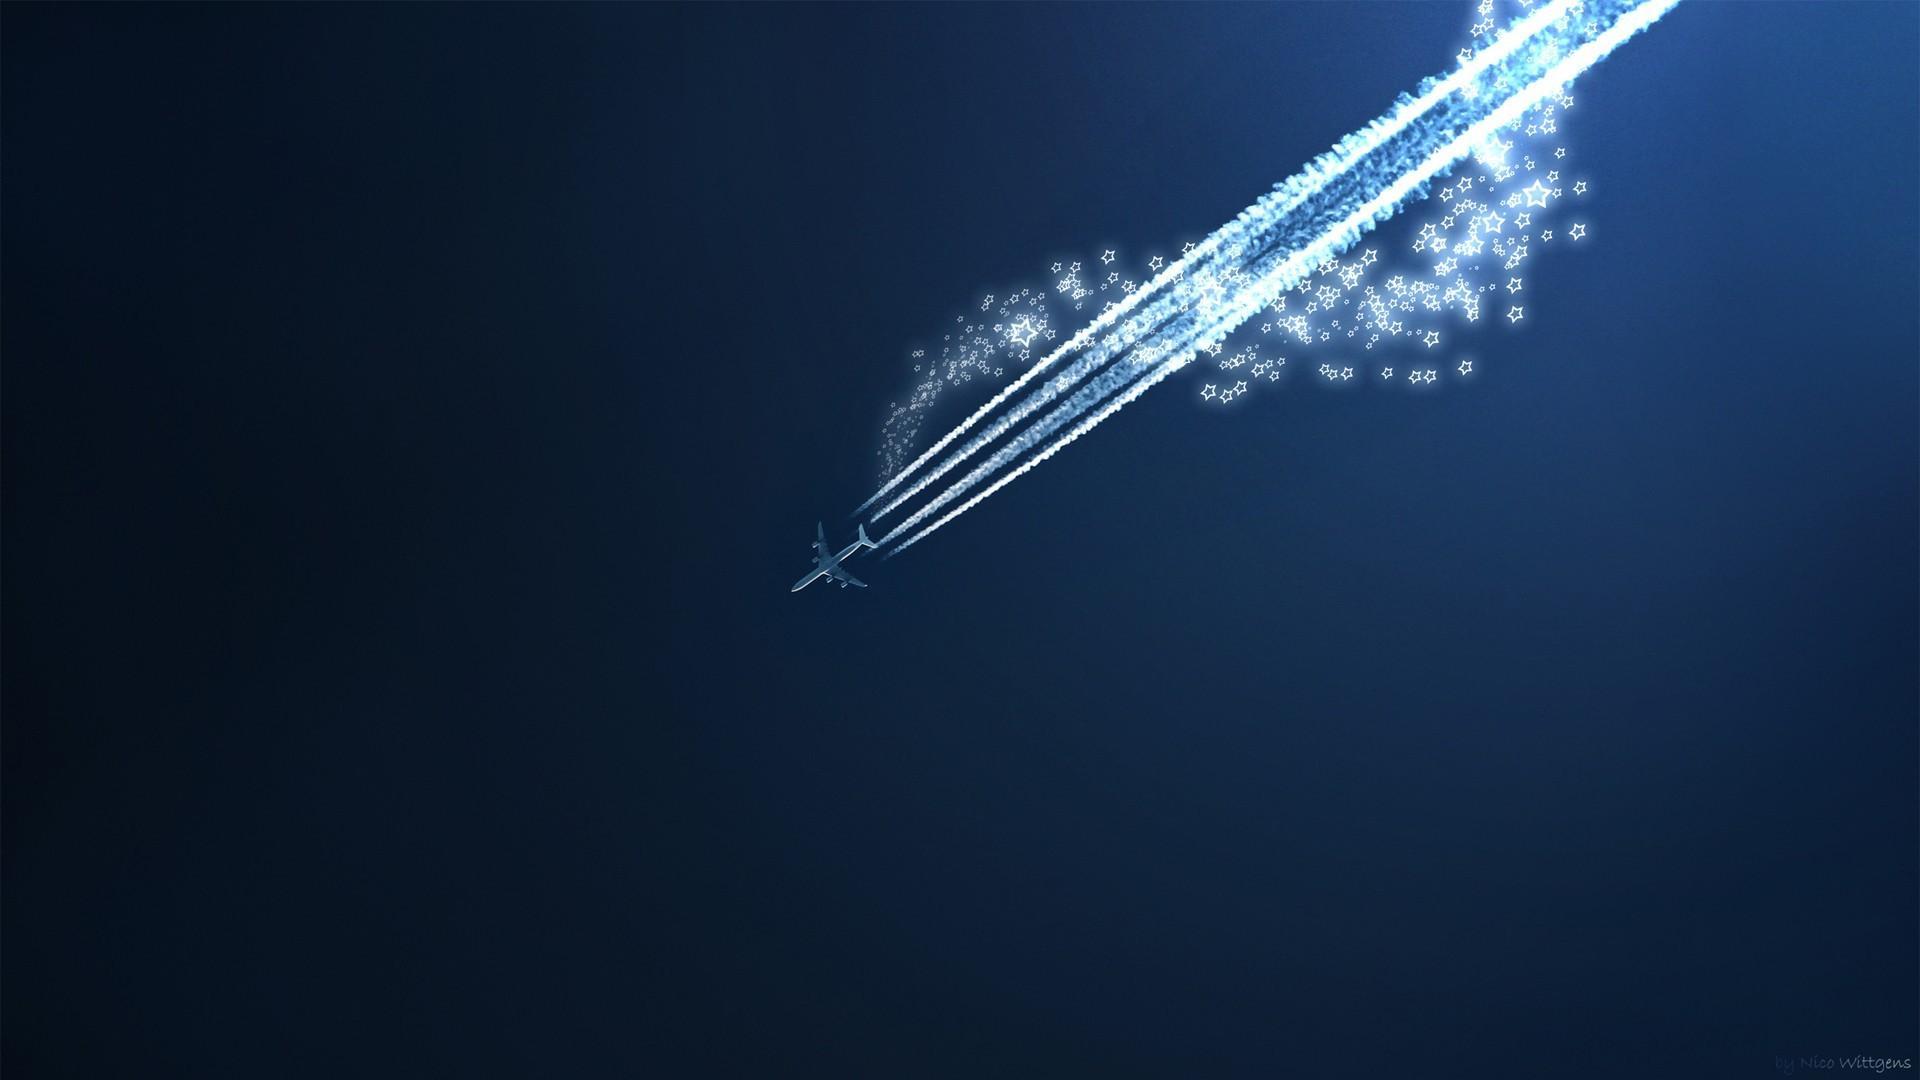 Aircraft shooting star blue background wallpaper 14789 1920x1080